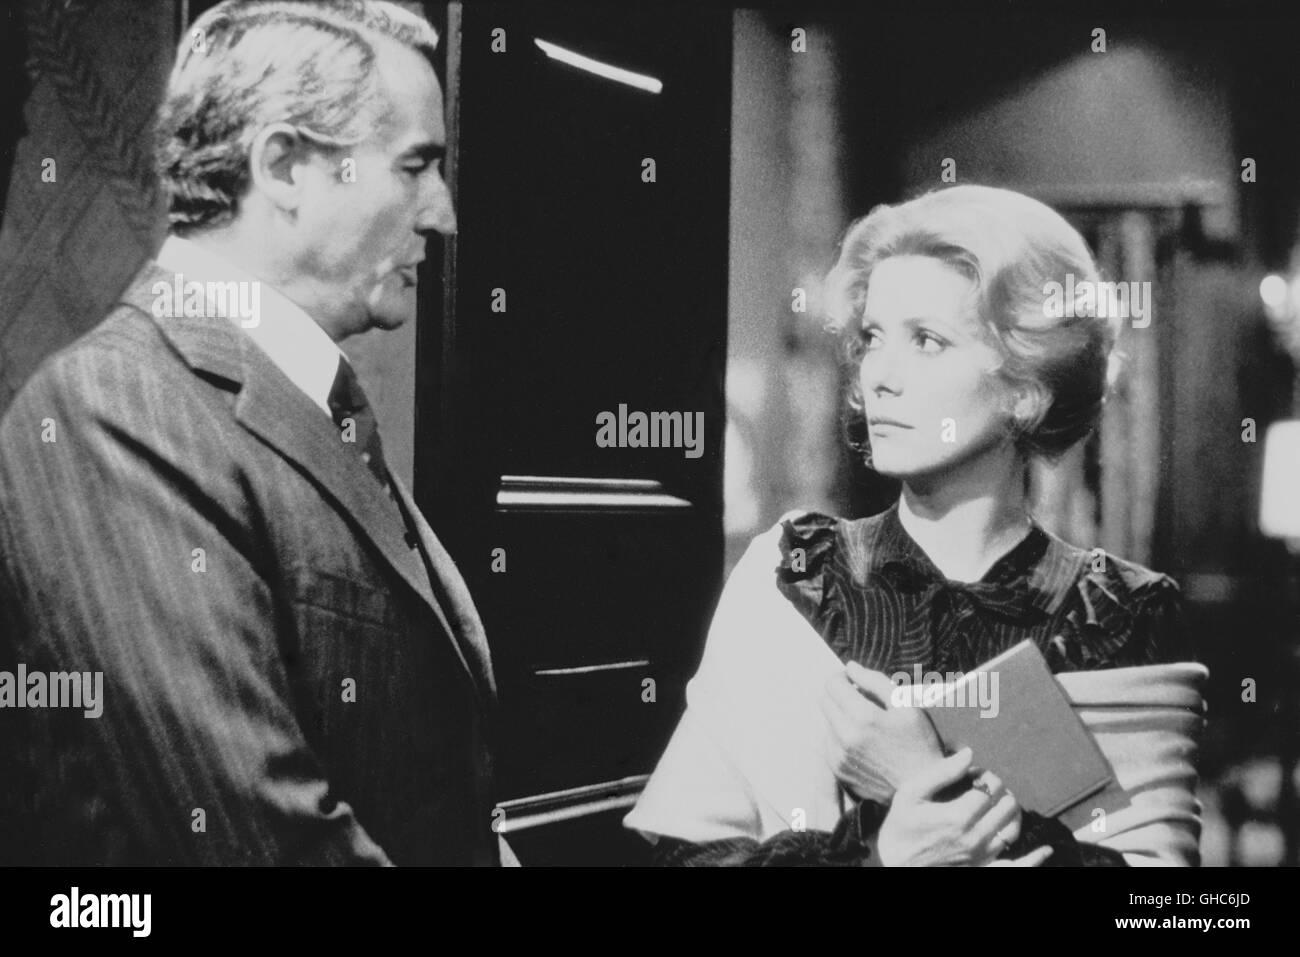 Anima Persa 1977 catherine deneuve black and white stock photos & images